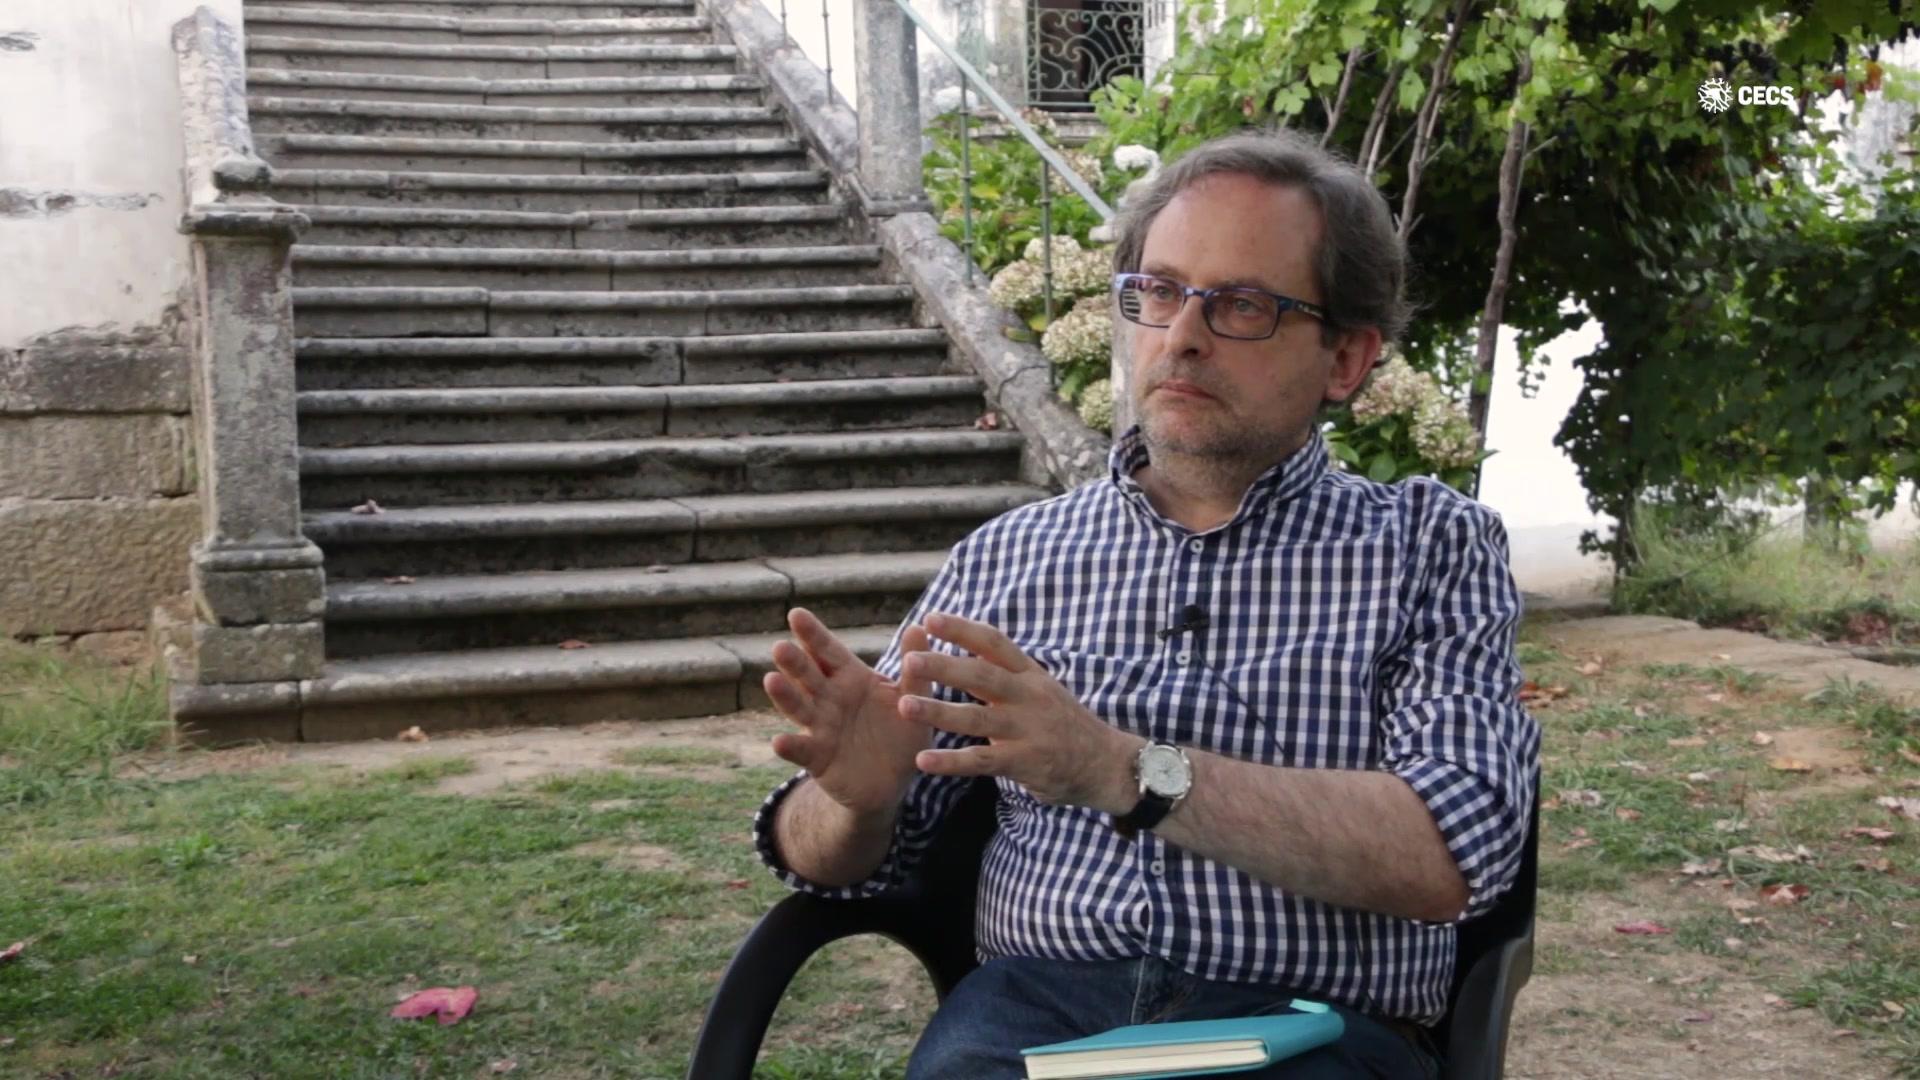 Entrevista a Jorge Leandro Rosa